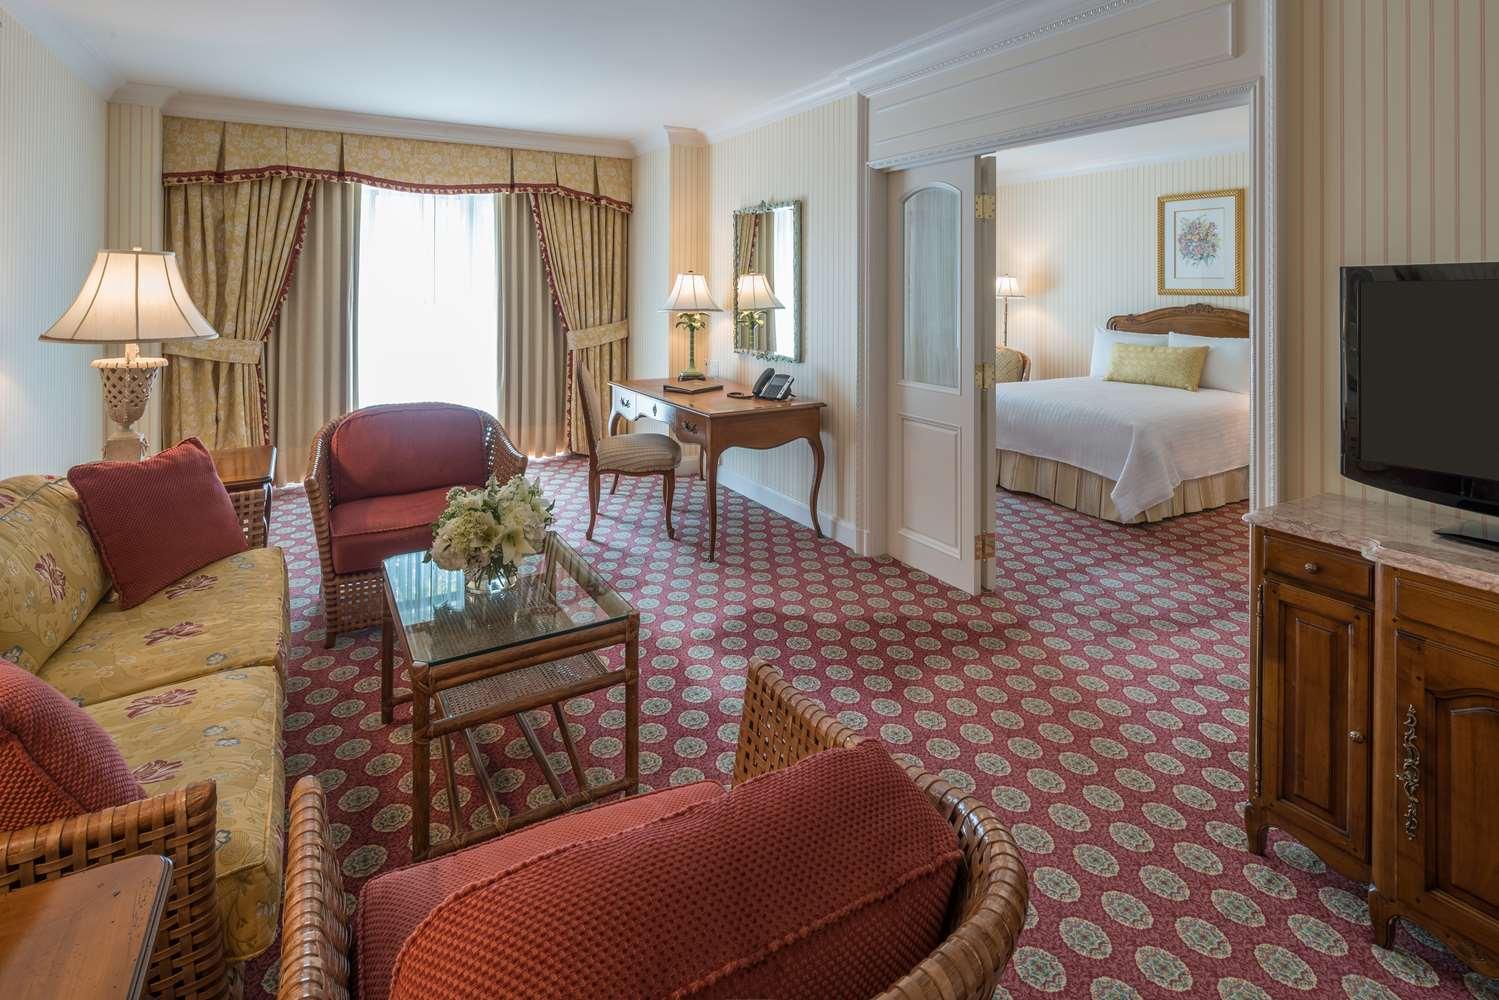 Grand America Hotel Salt Lake City Ut See Discounts